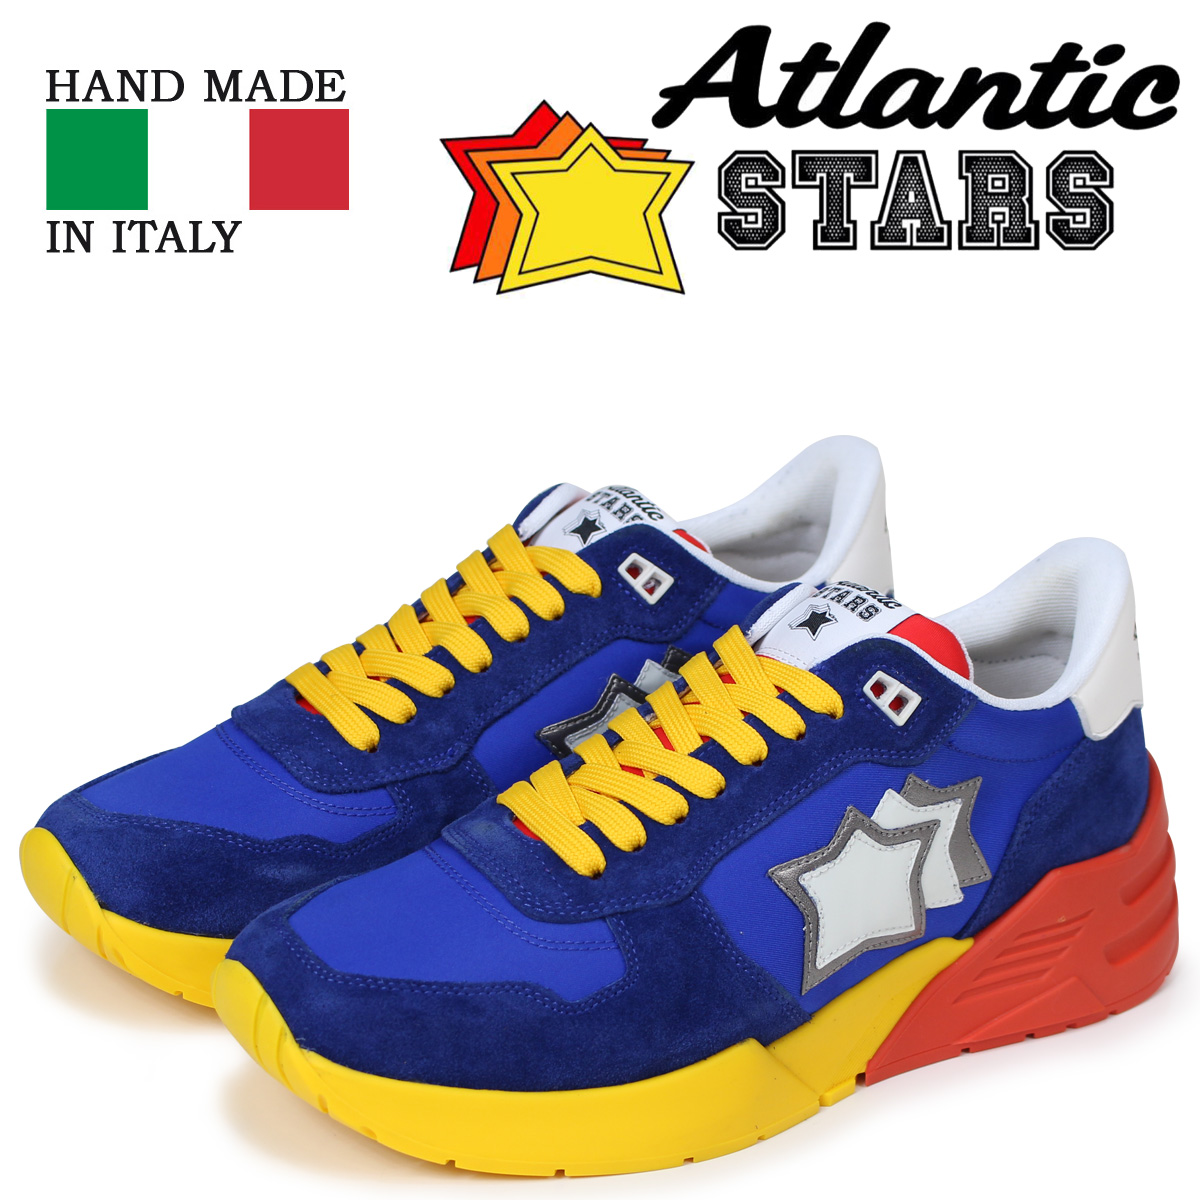 Atlantic STARS メンズ スニーカー アトランティックスターズ マーズ MARS AM-SN07 ブルー